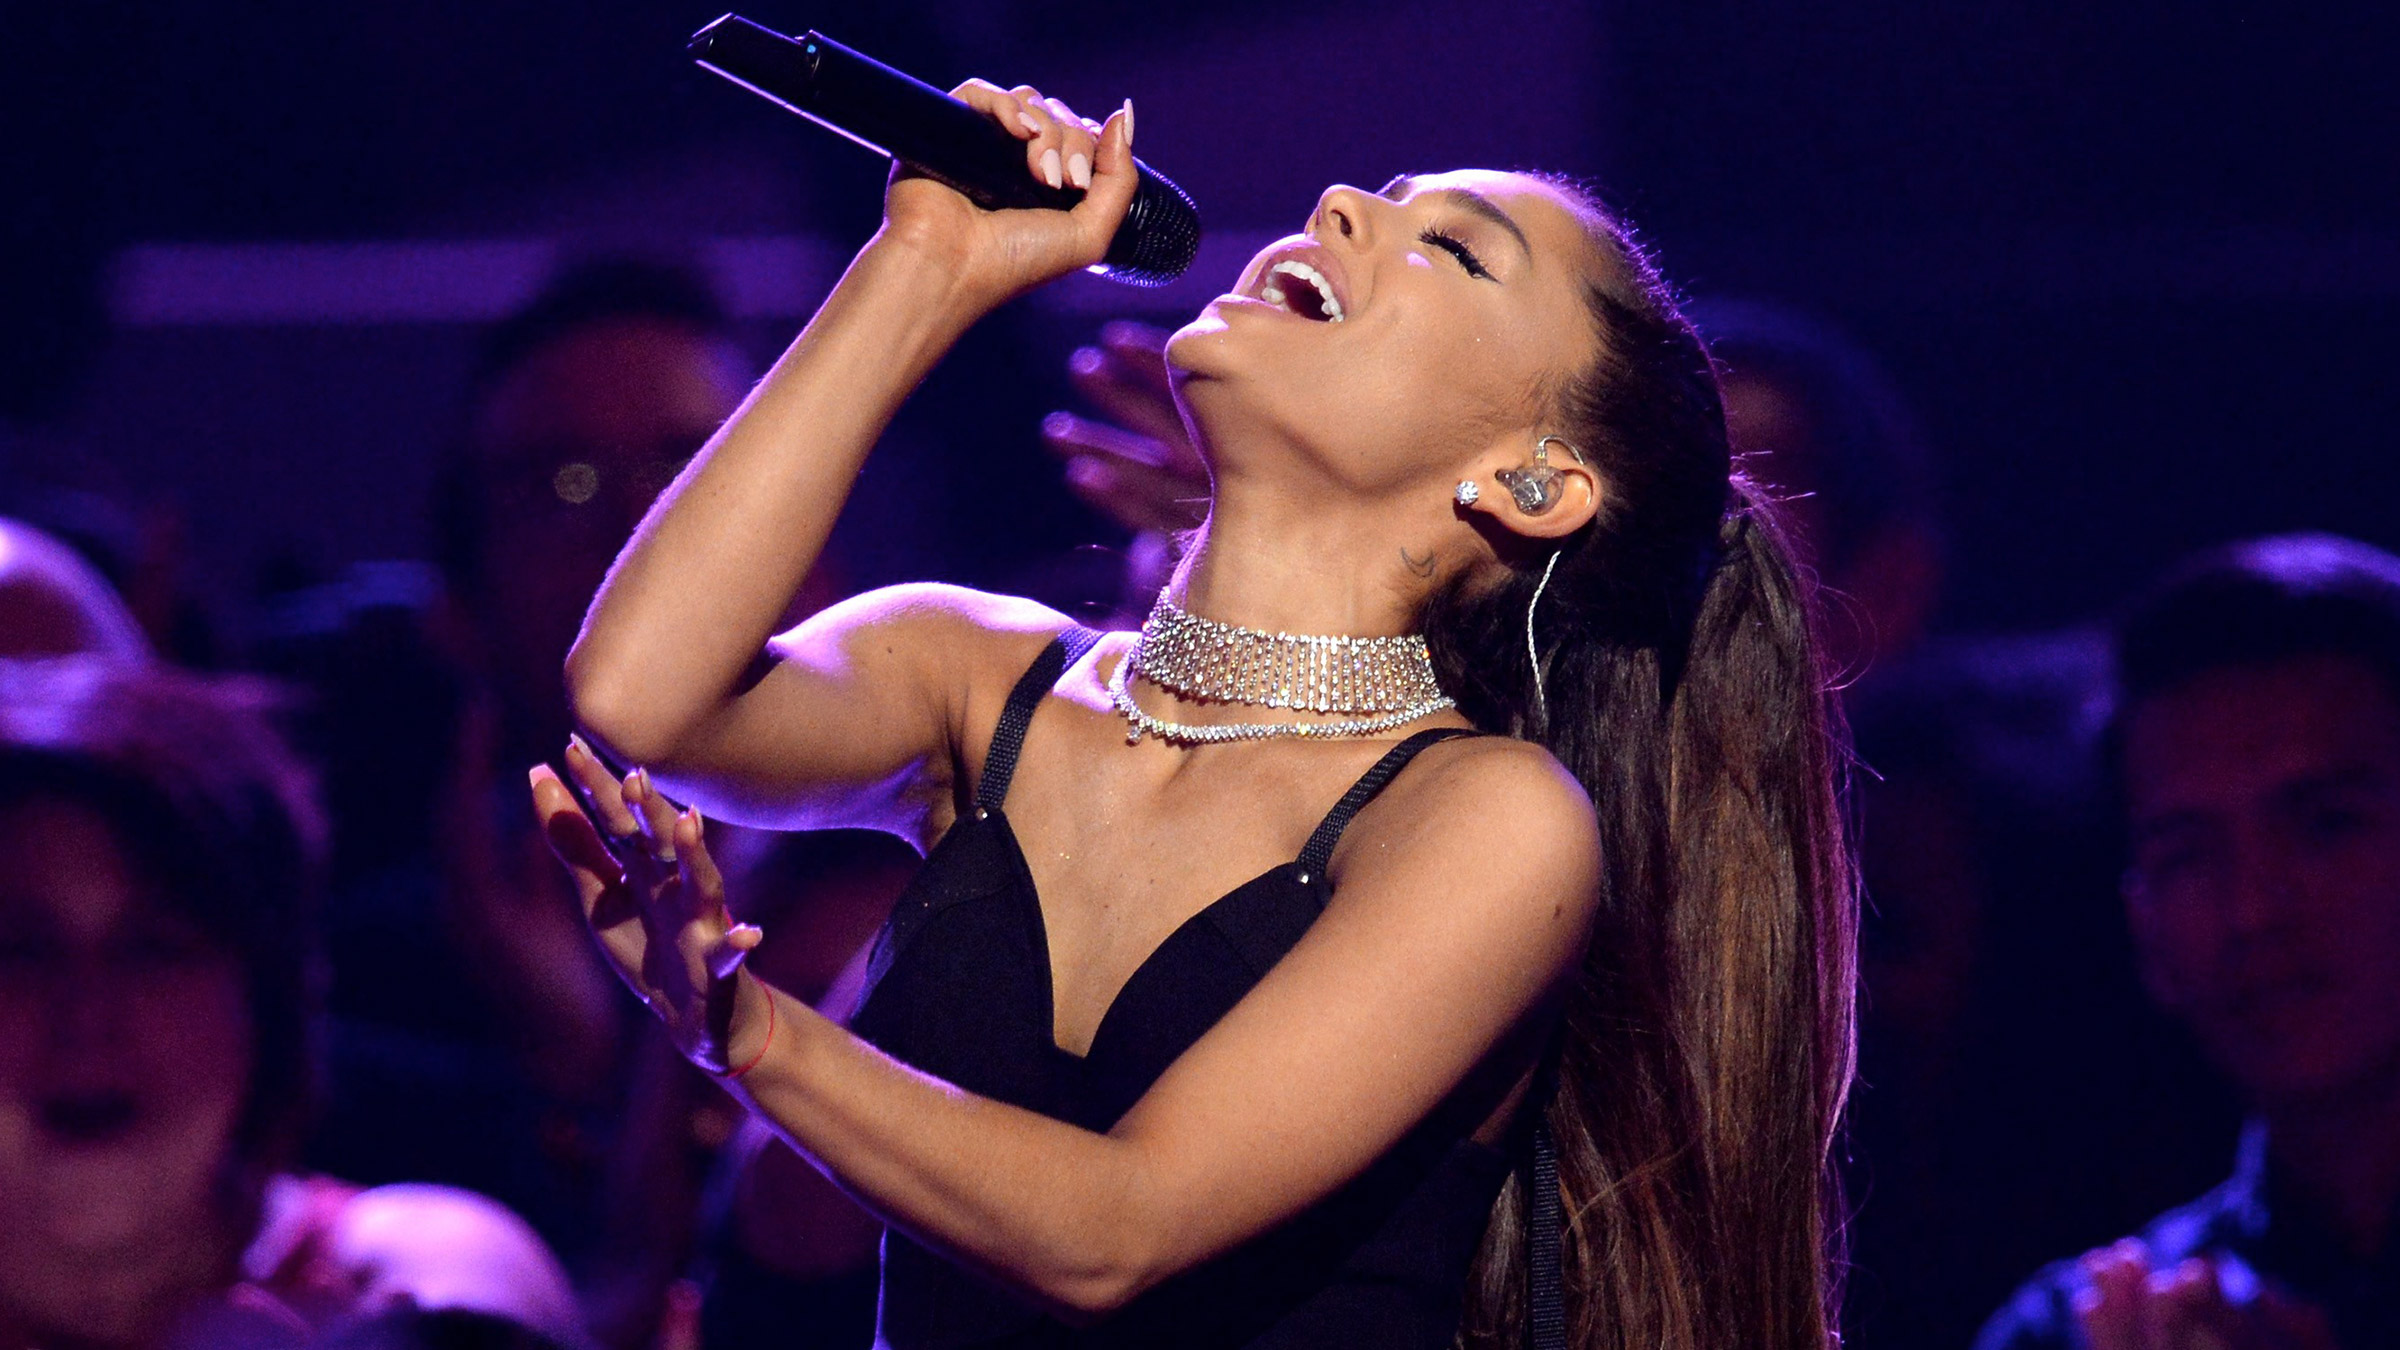 Ariana teaserafb